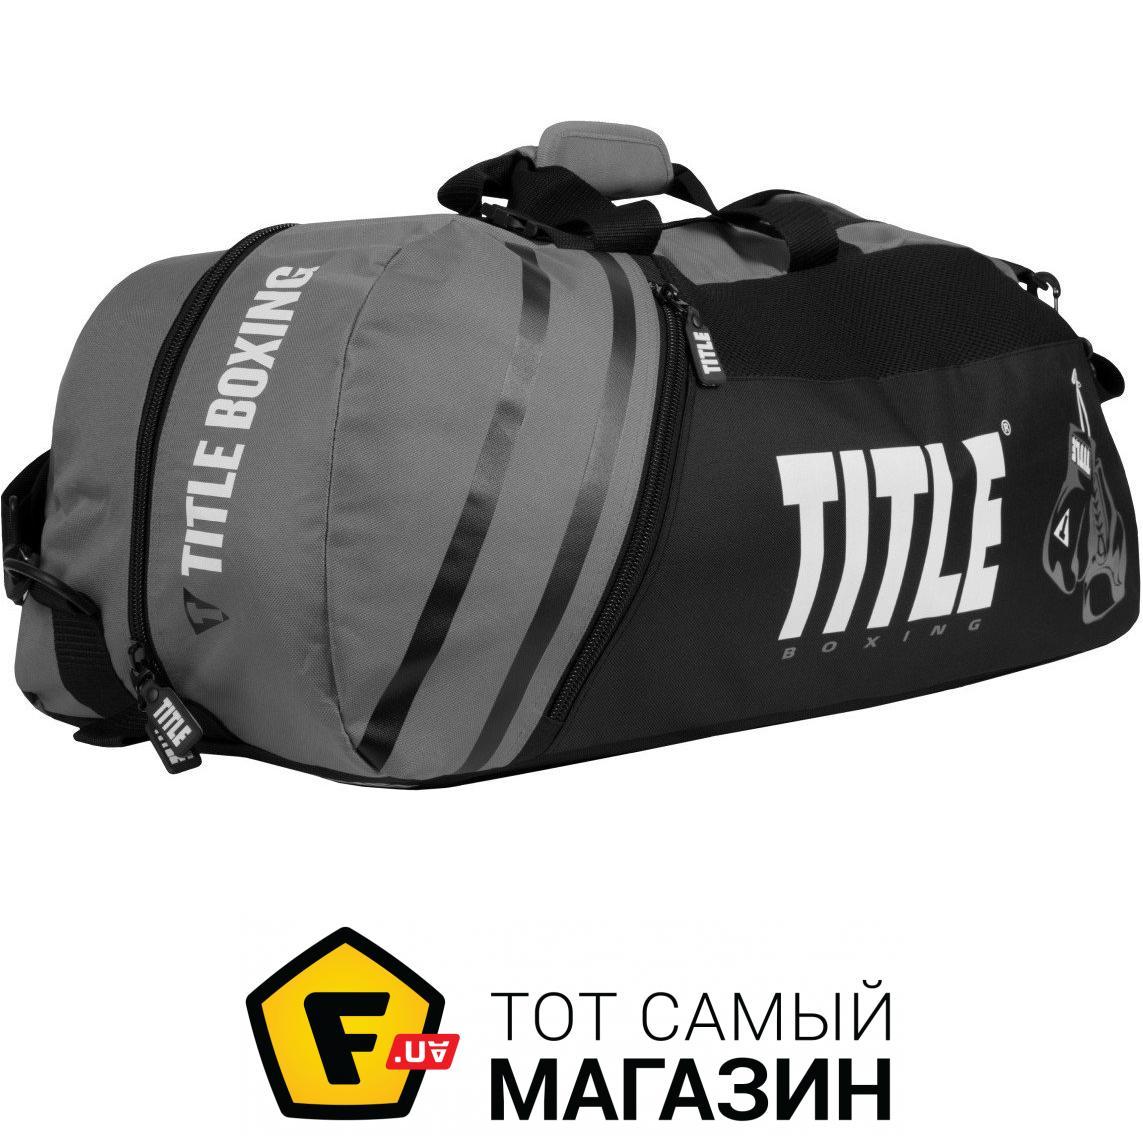 7da6da54b4f5 ᐈ TITLE BOXING World Champion Sport 2.0 черный /серый (TBAG25 ...